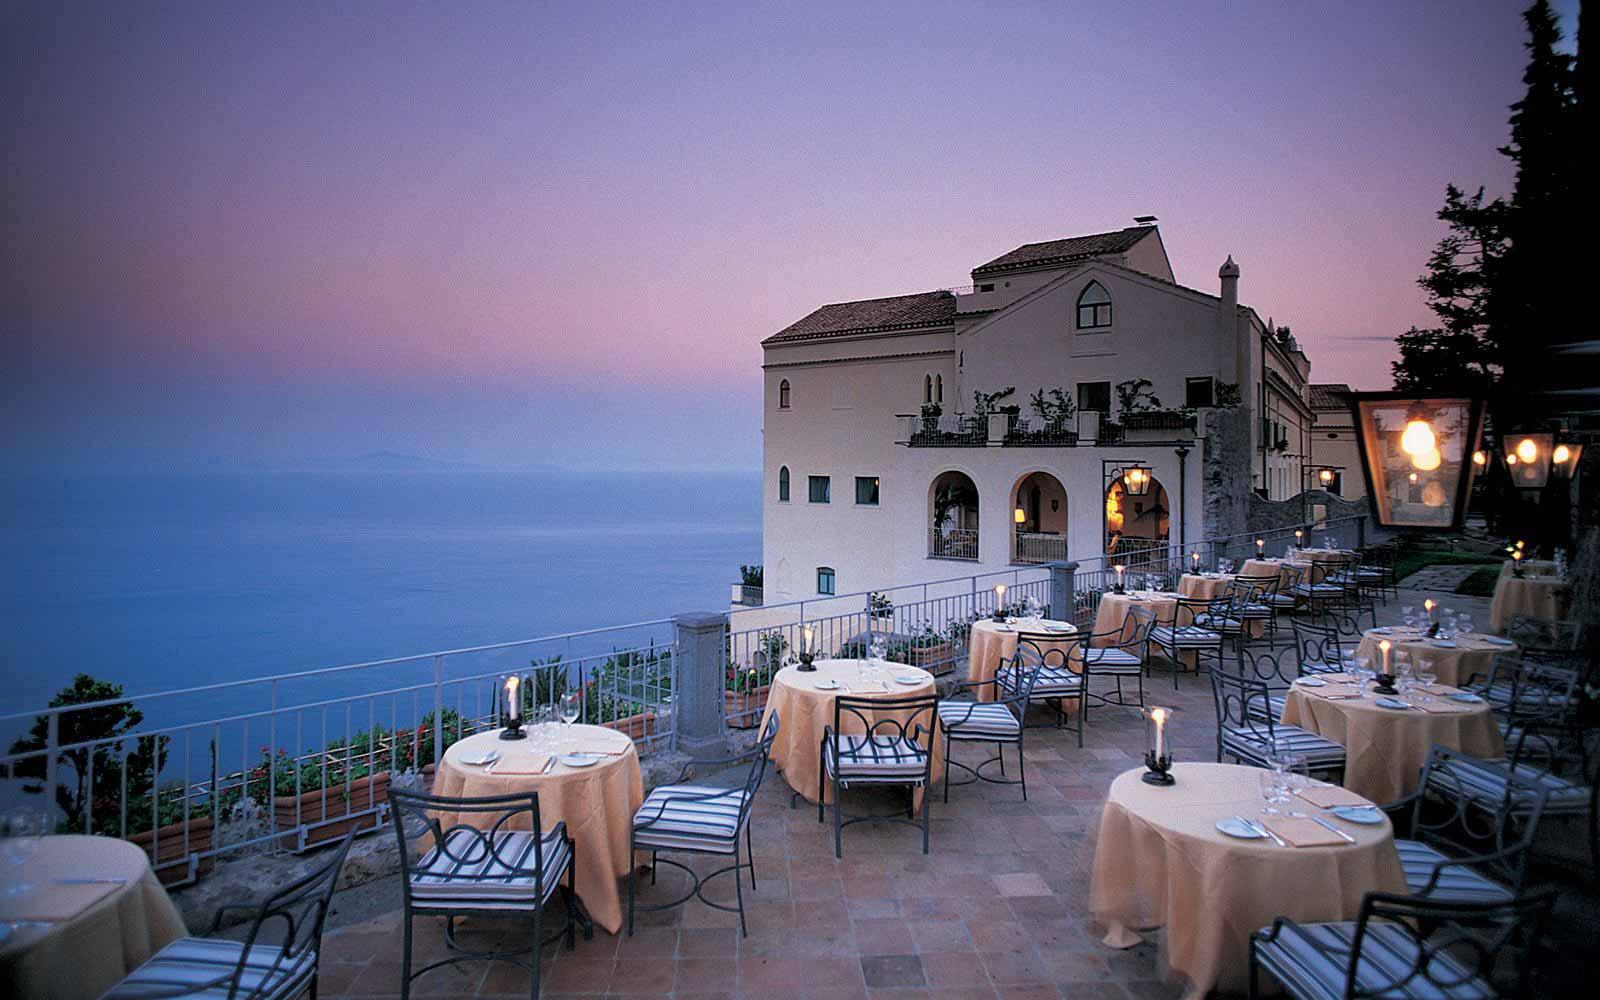 The Belveder Restaurant at Belmond Hotel Caruso